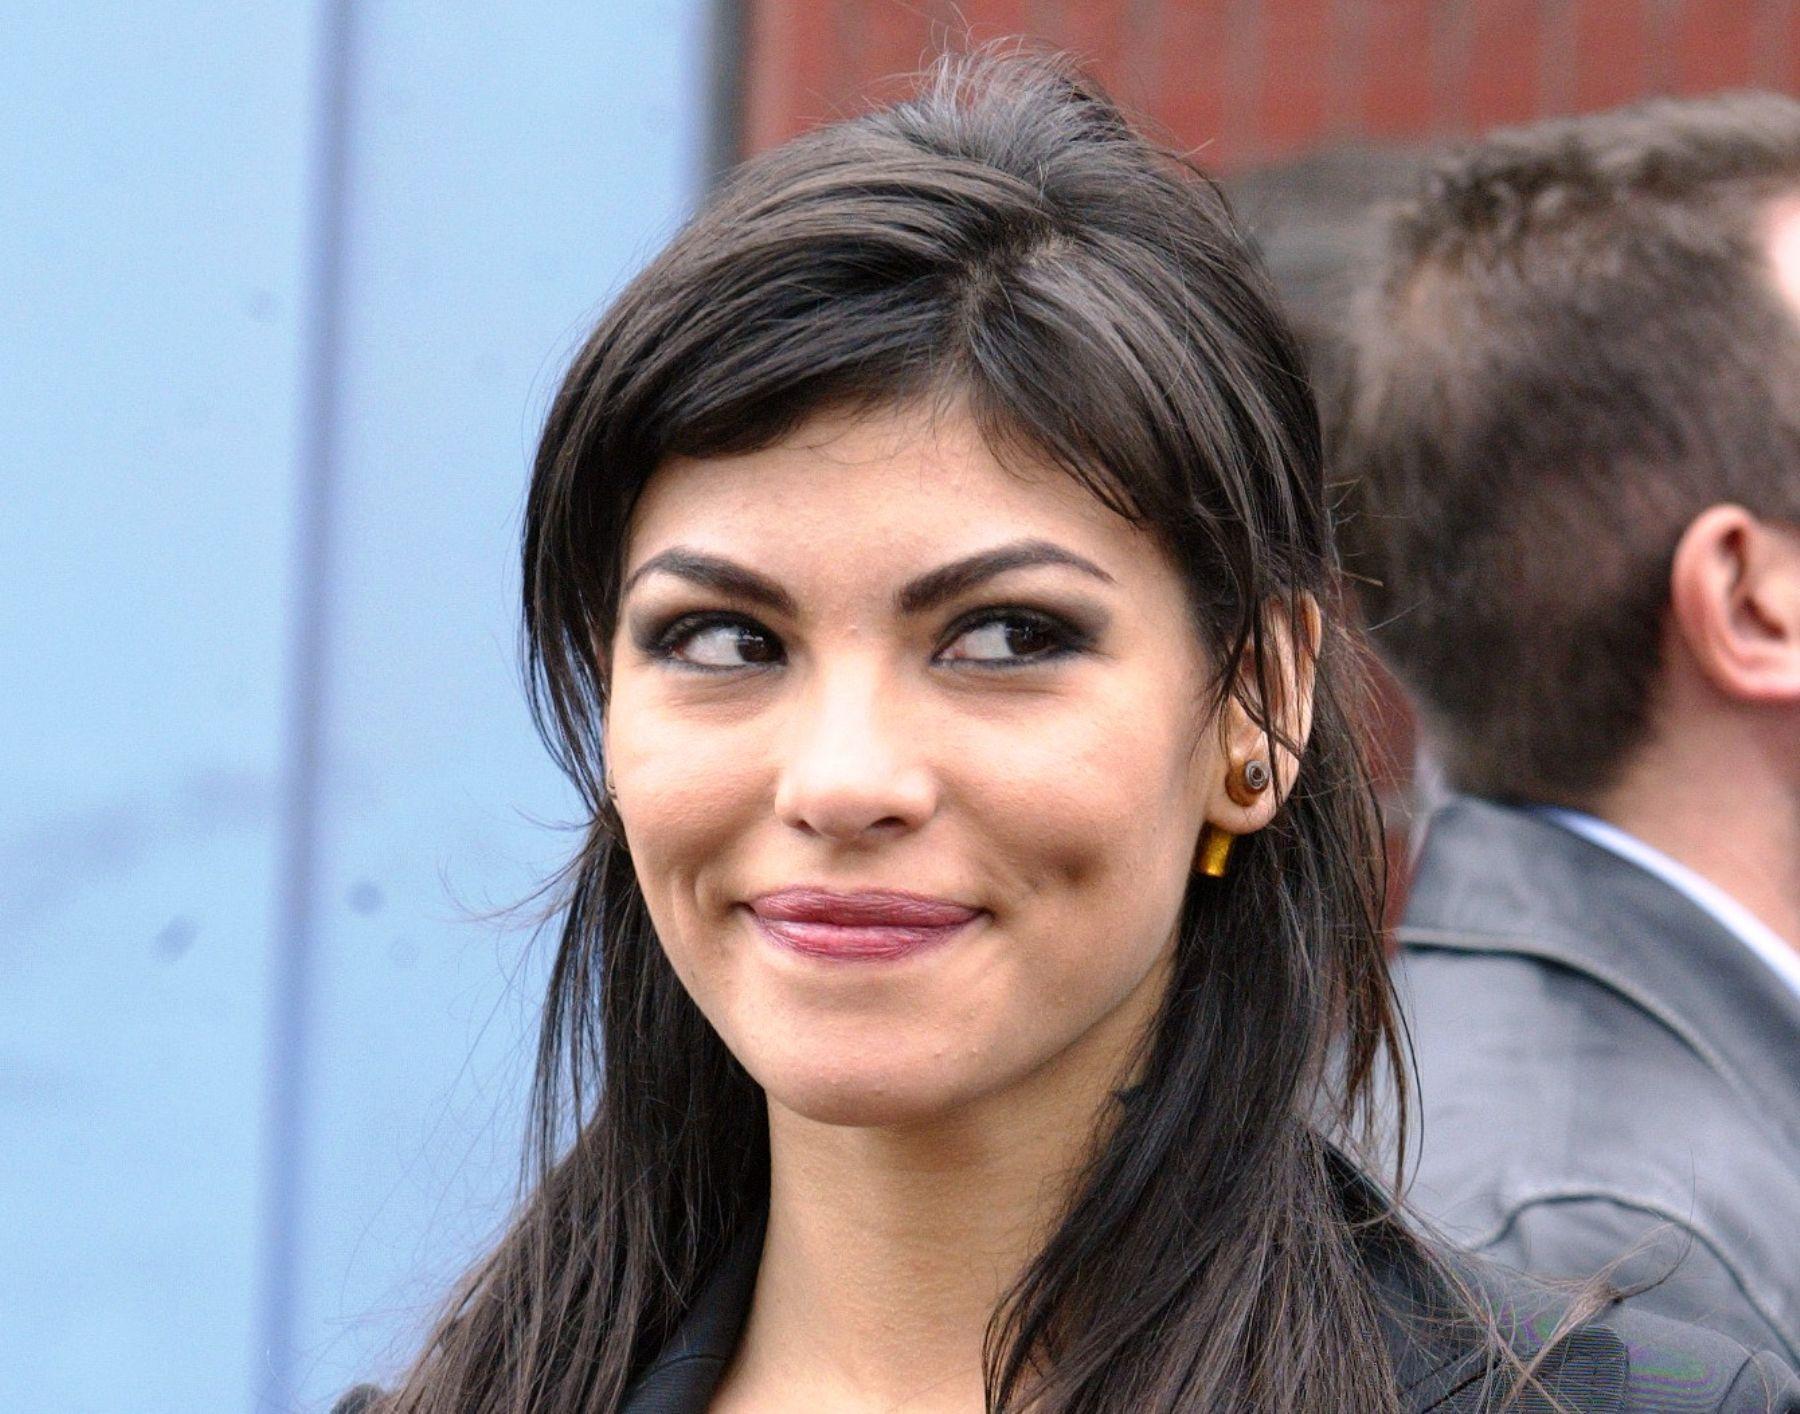 Angie Jibaja facial